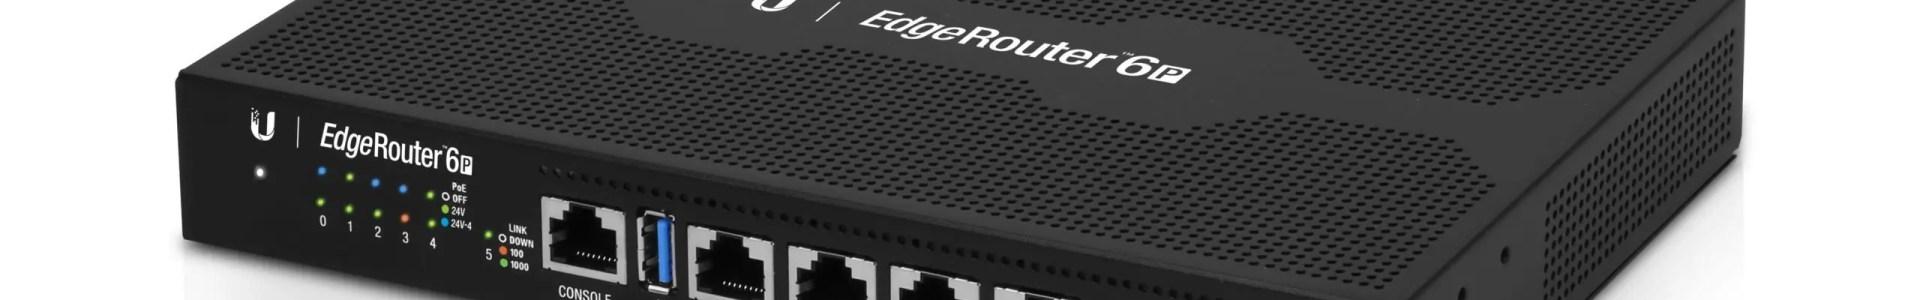 EdgeRouter 6P ראוטר מקצועי